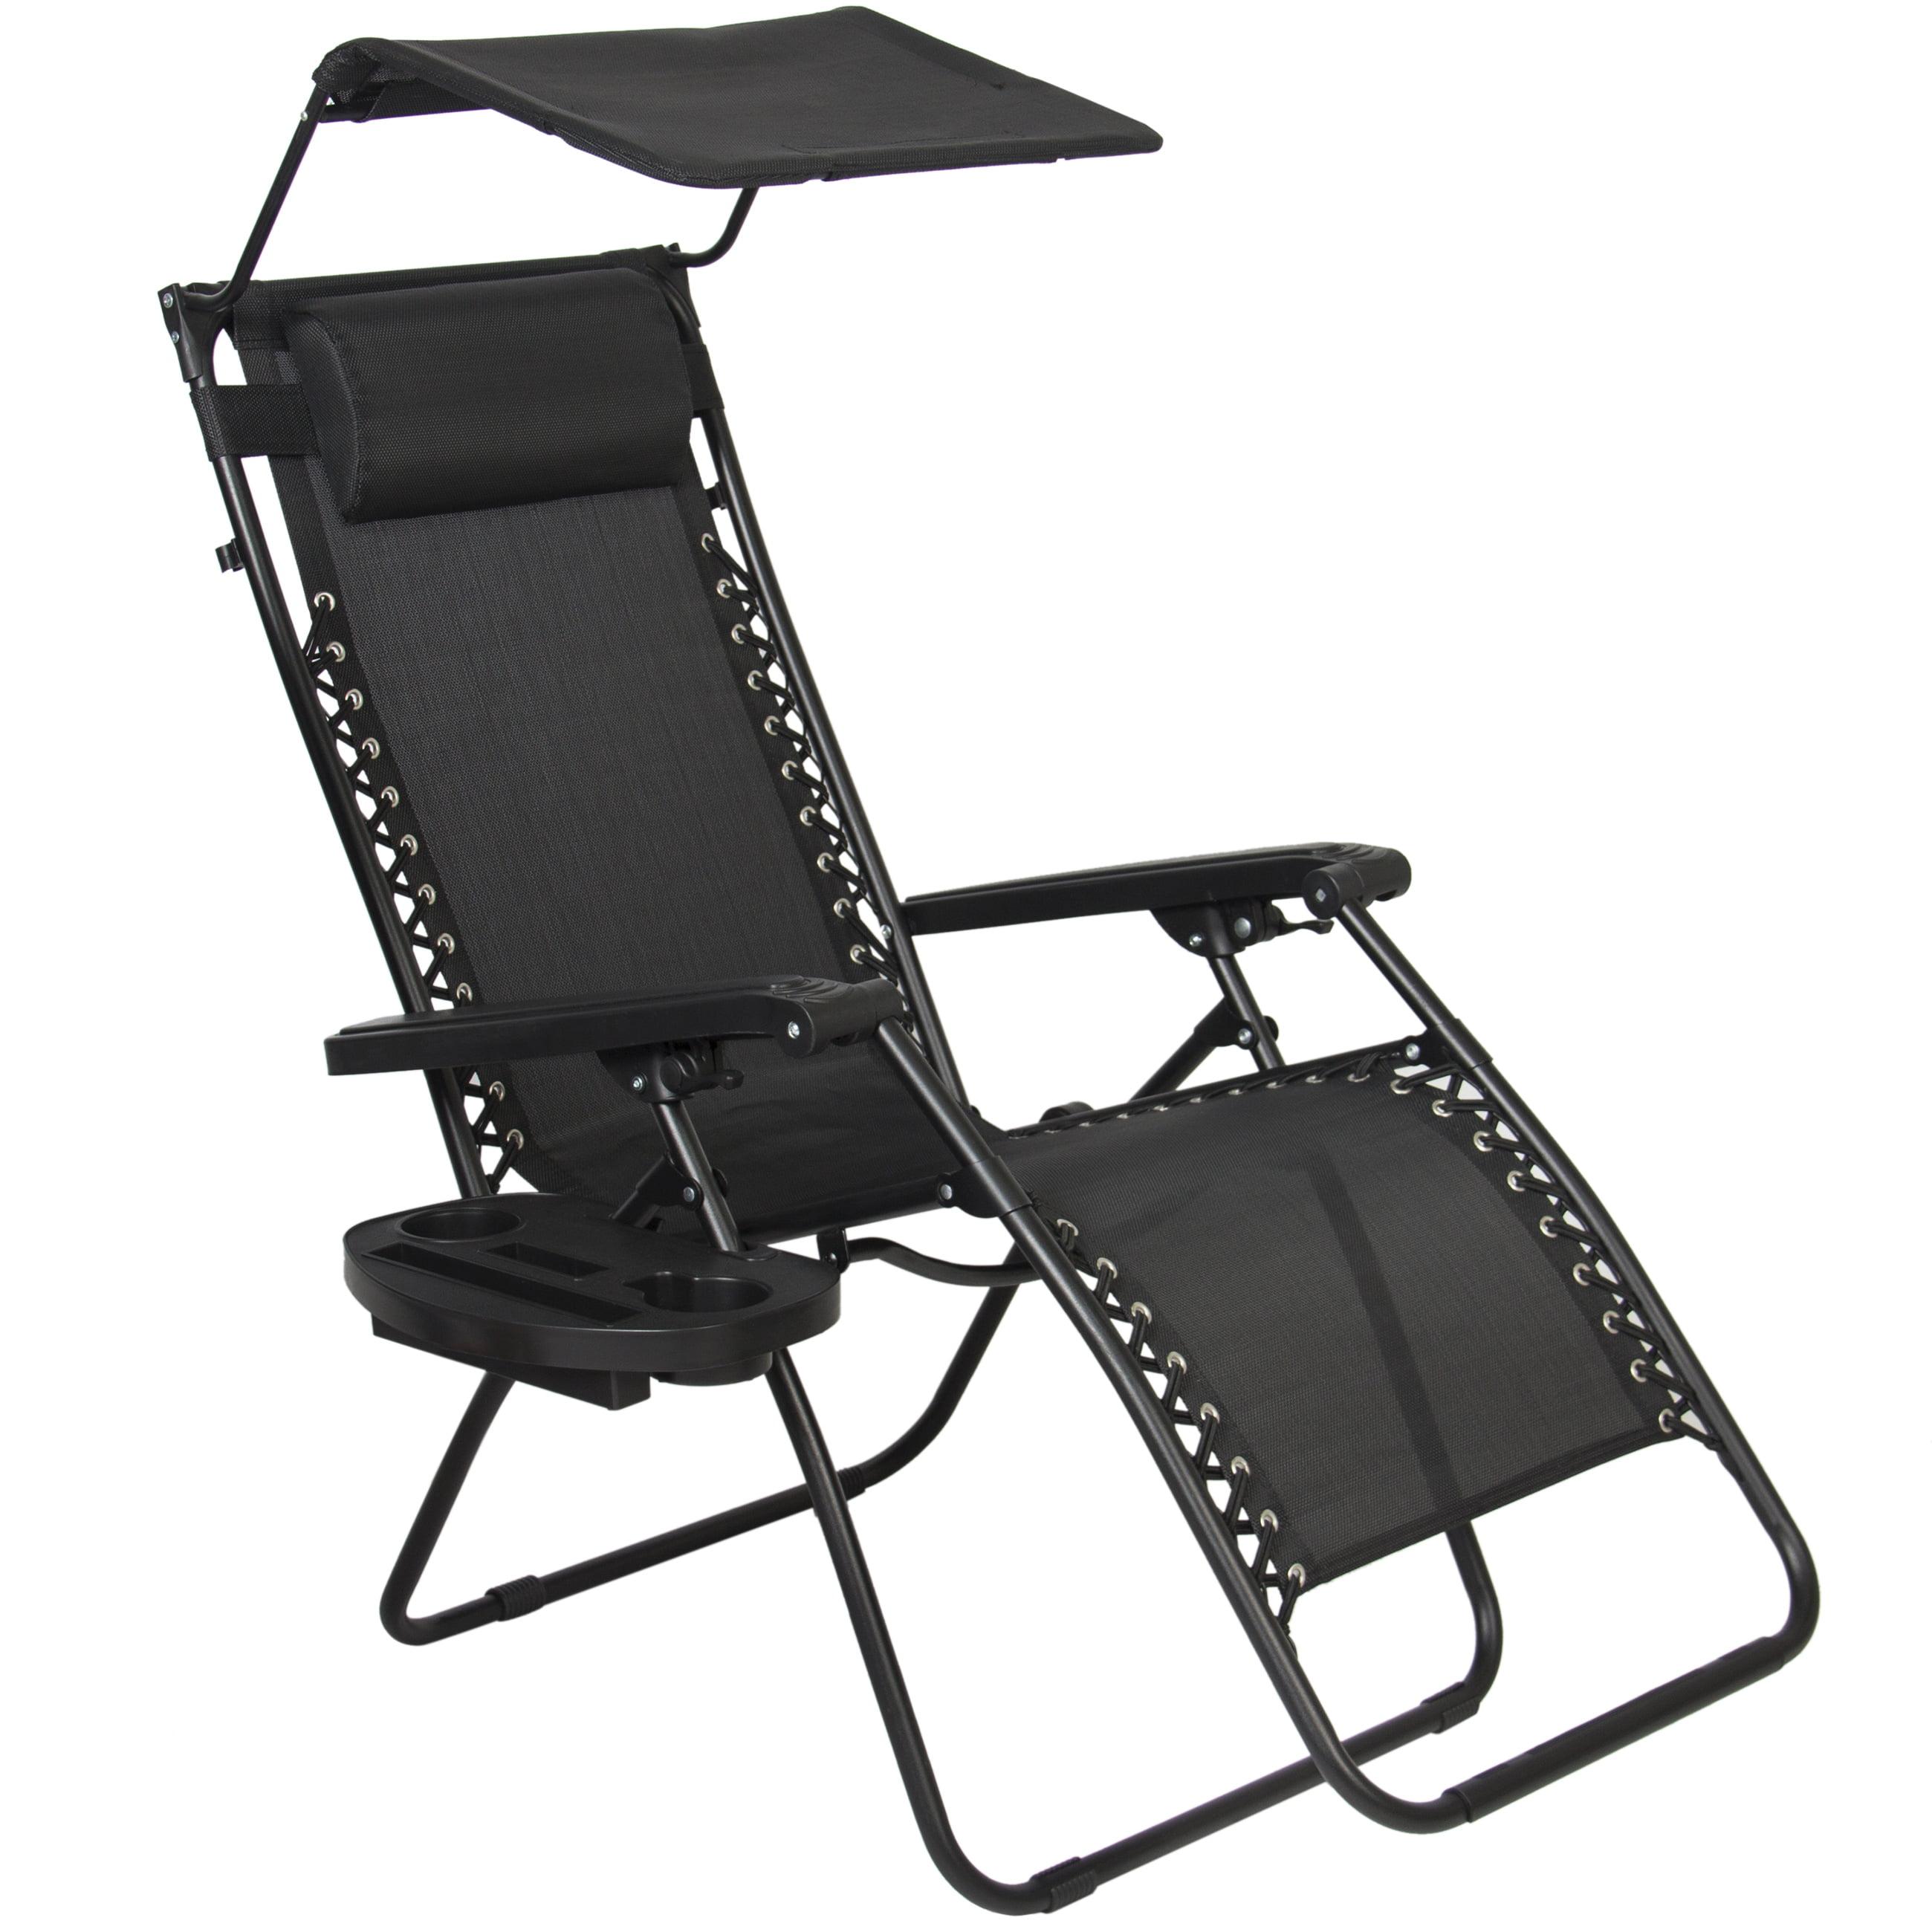 Patio Chairs Page 4 Walmart